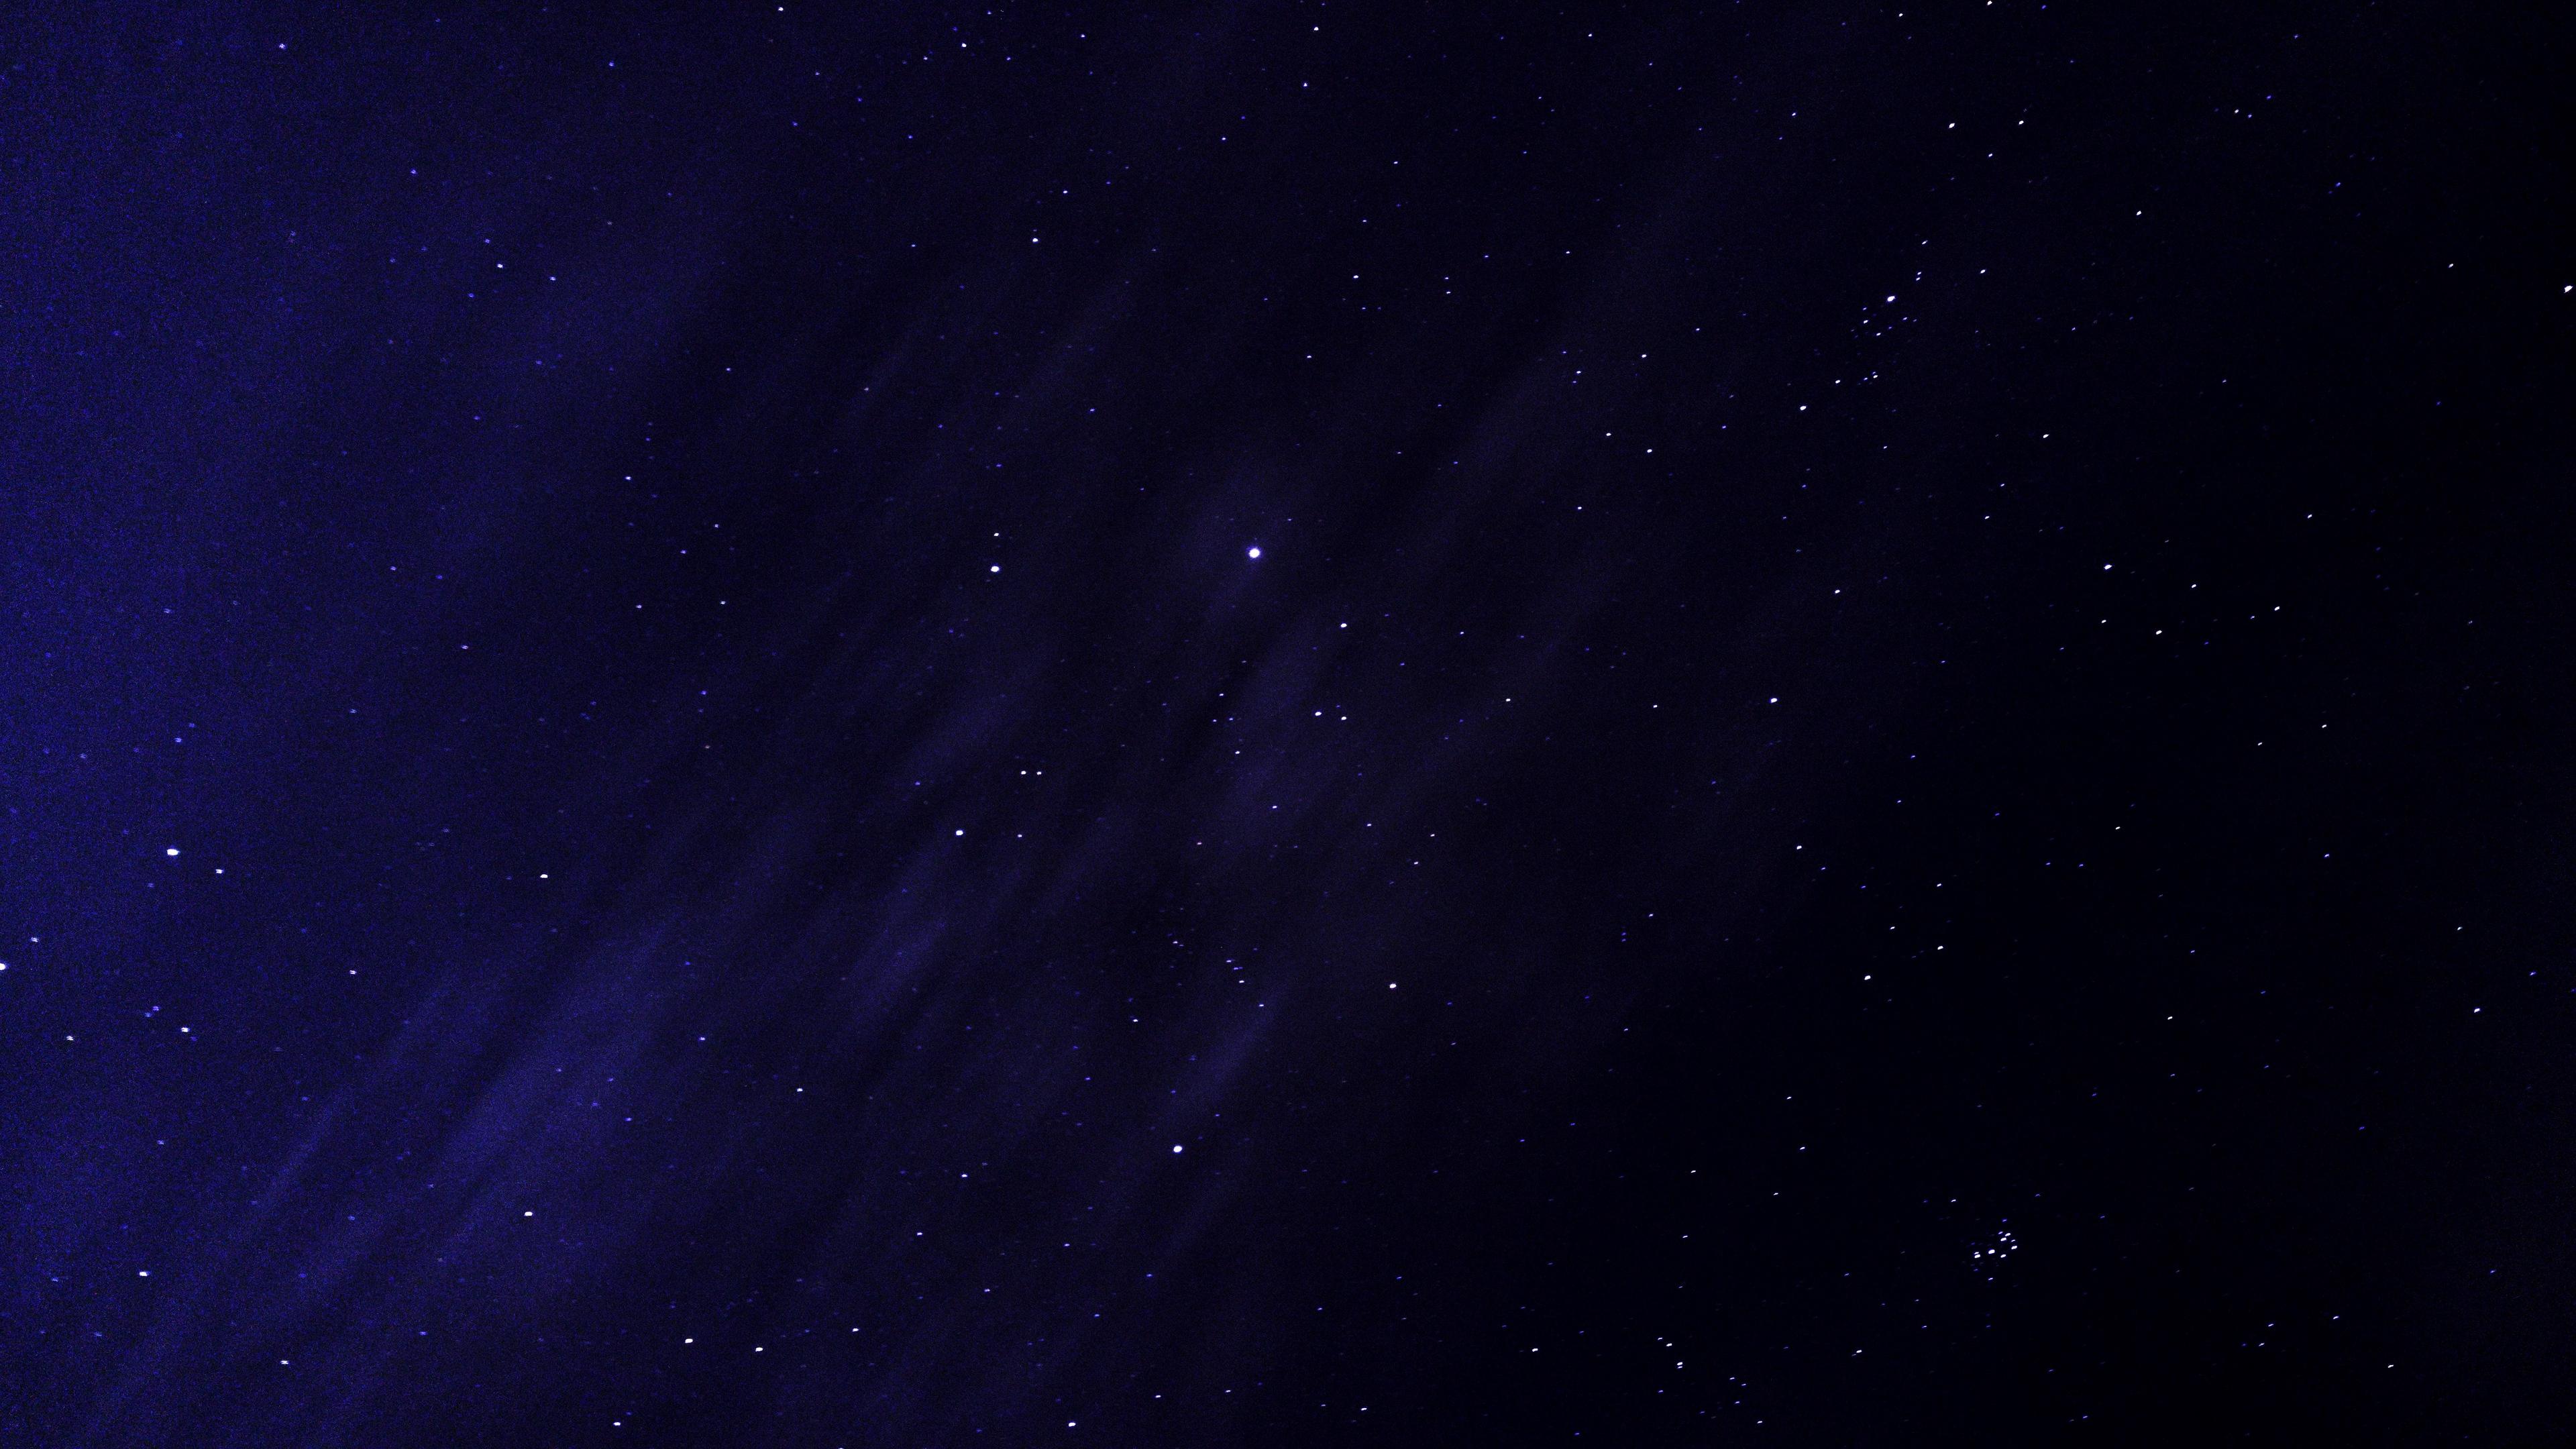 starry sky stars night glitter 4k 1536013930 - starry sky, stars, night, glitter 4k - Stars, starry sky, Night